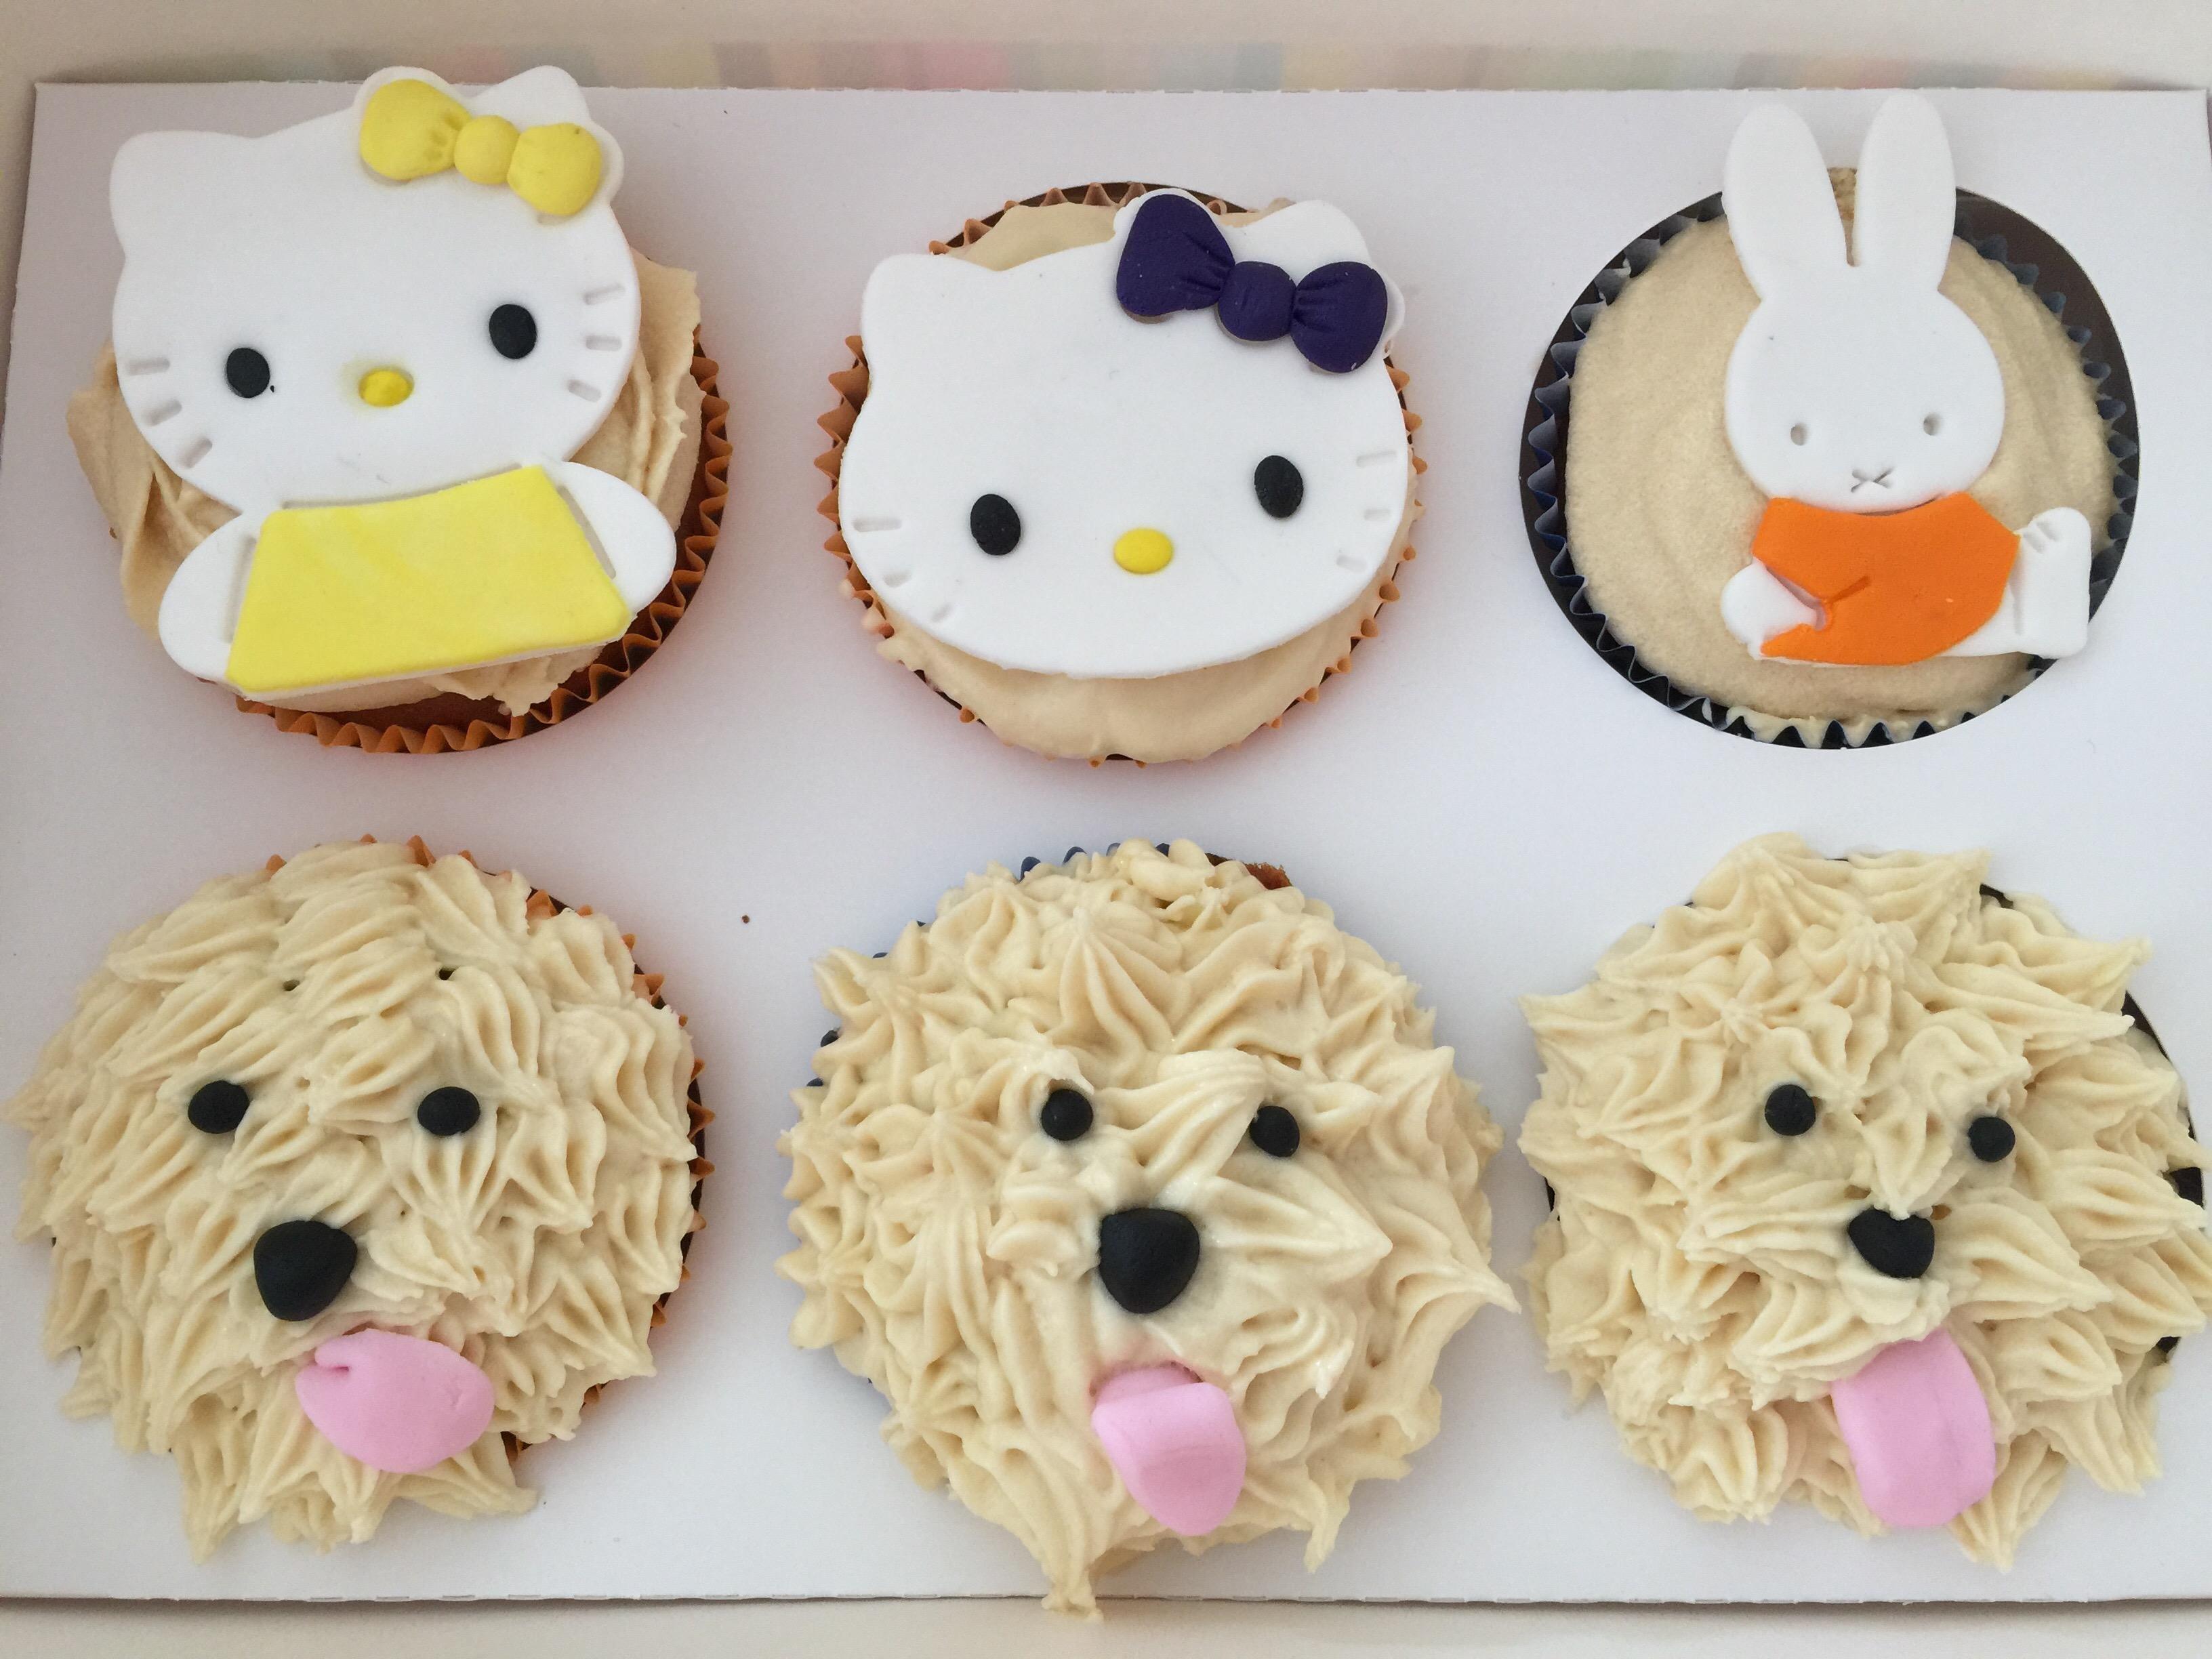 SPCA Cupcake Day